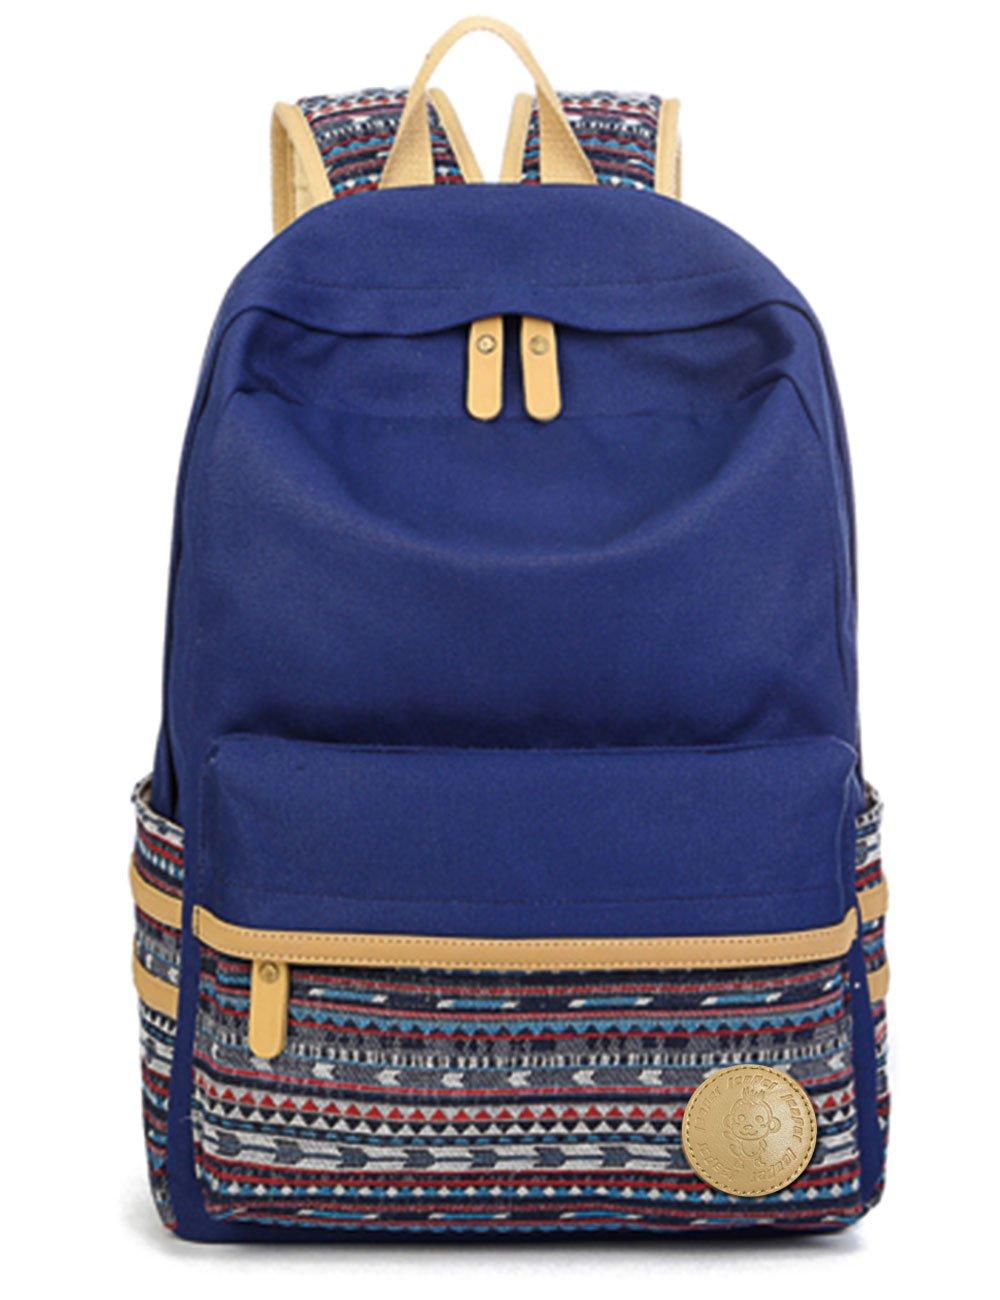 Leaper Casual Style Lightweight Canvas Laptop Bag Cute Backpack Shoulder Bag School Backpack Travel Bag (Navy Blue A3)